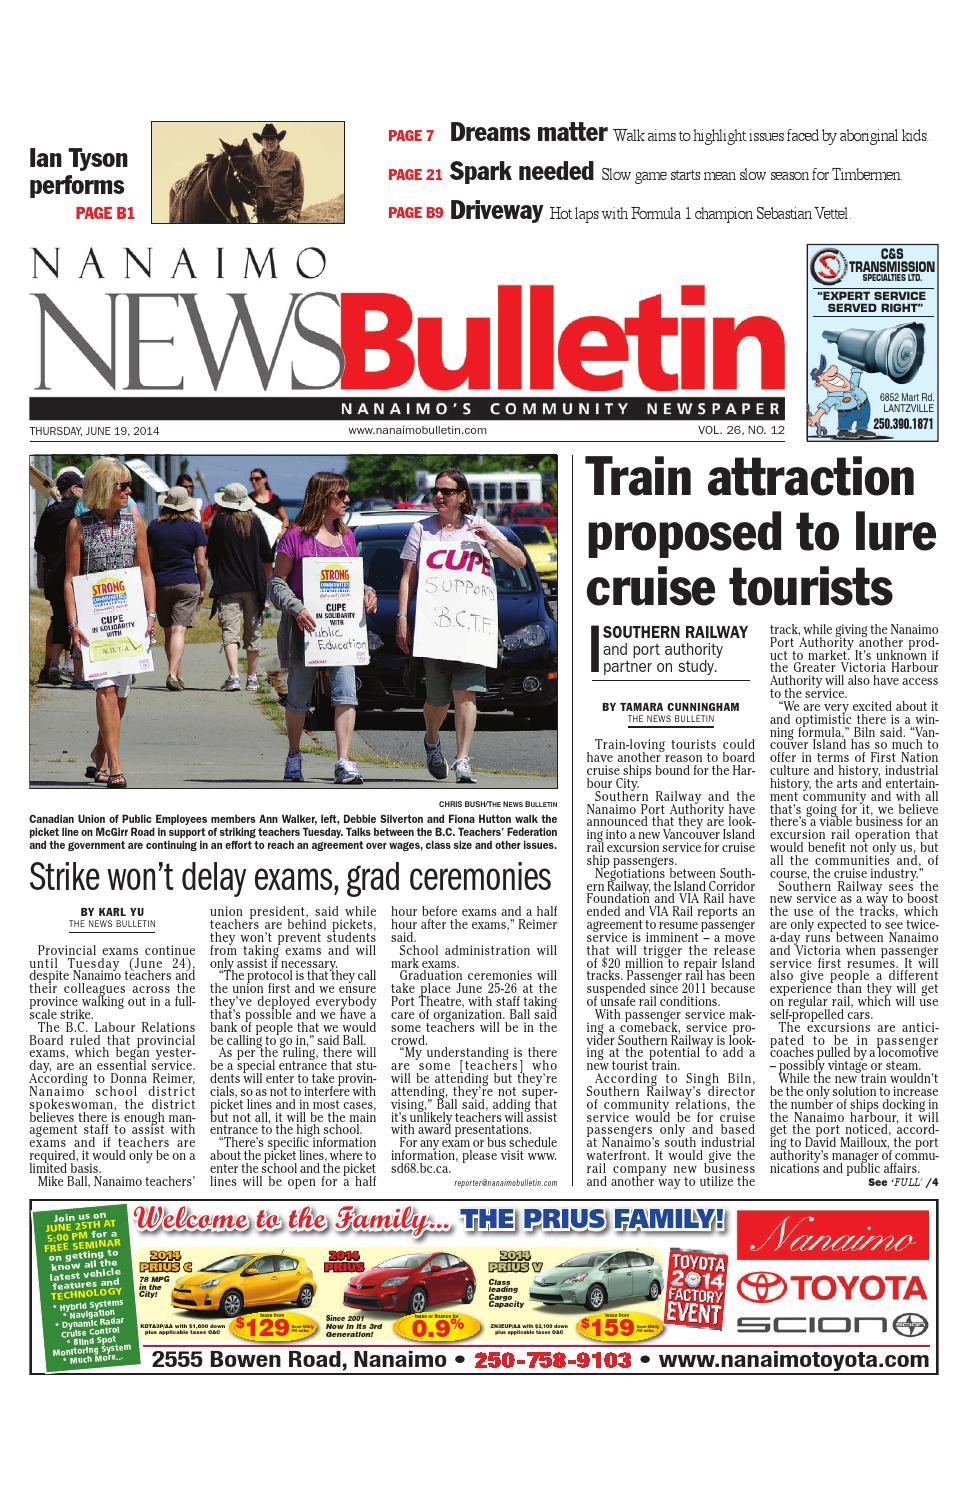 Bathmaster Nanaimo nanaimo news bulletin, june 19, 2014black press - issuu